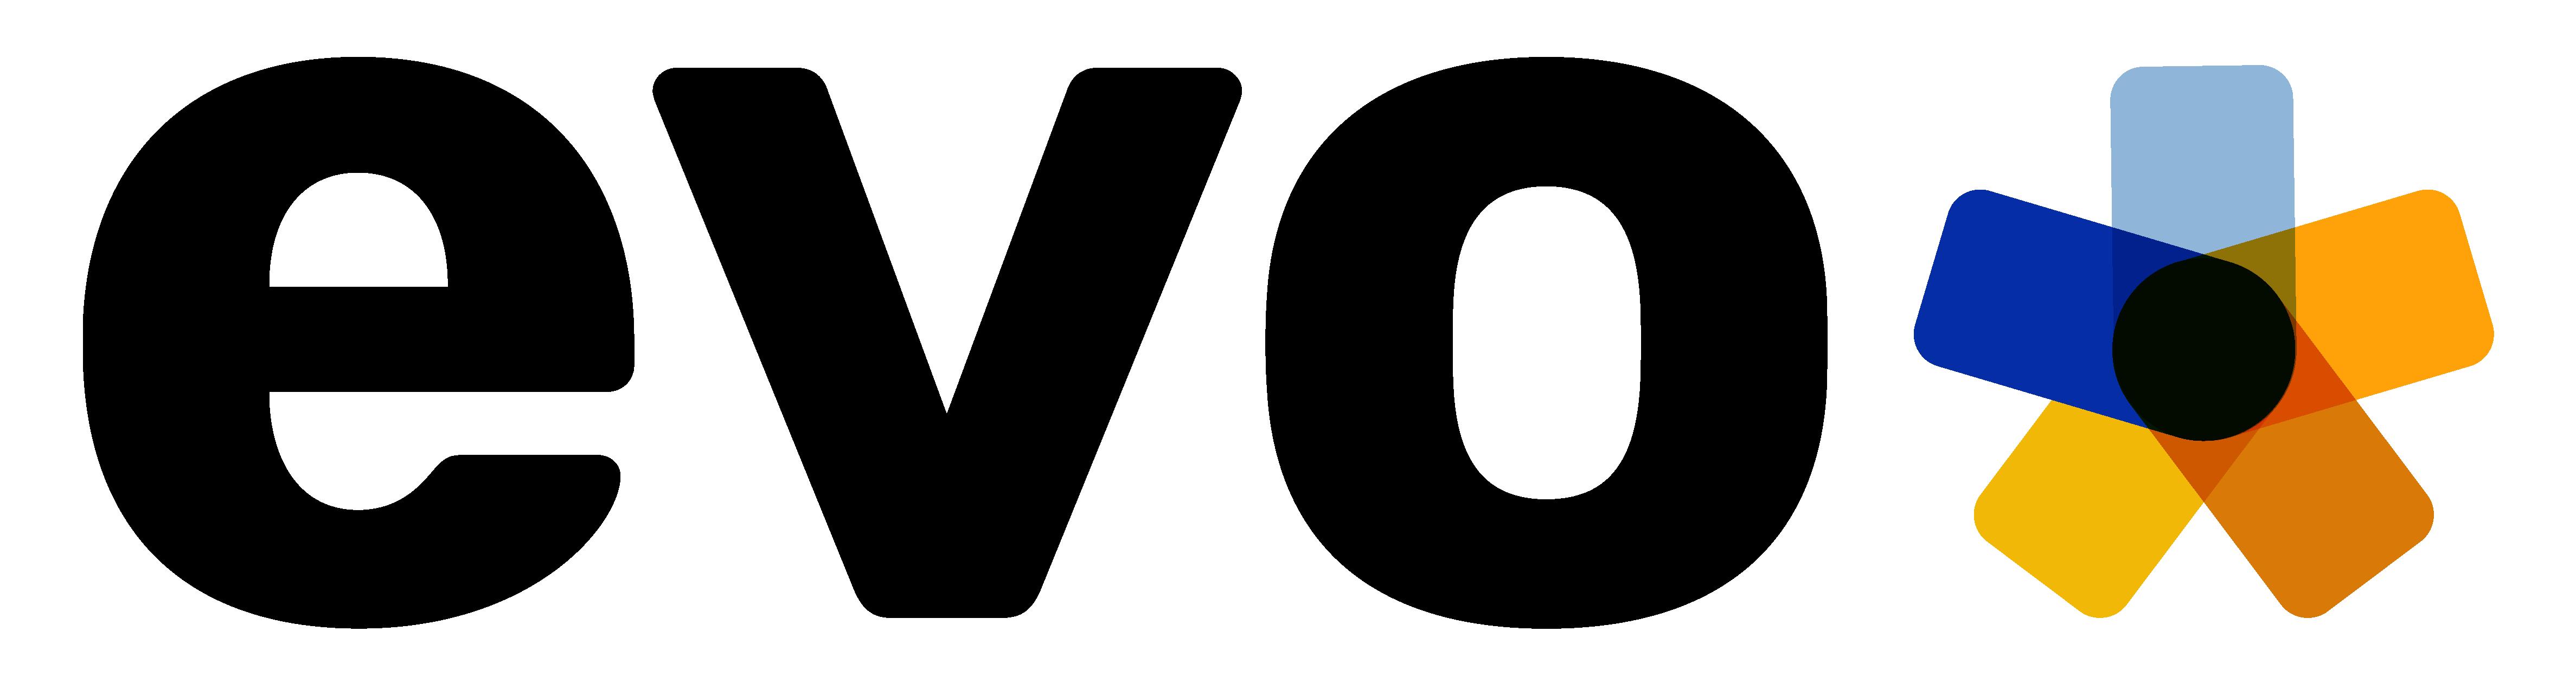 EvoStar 2021